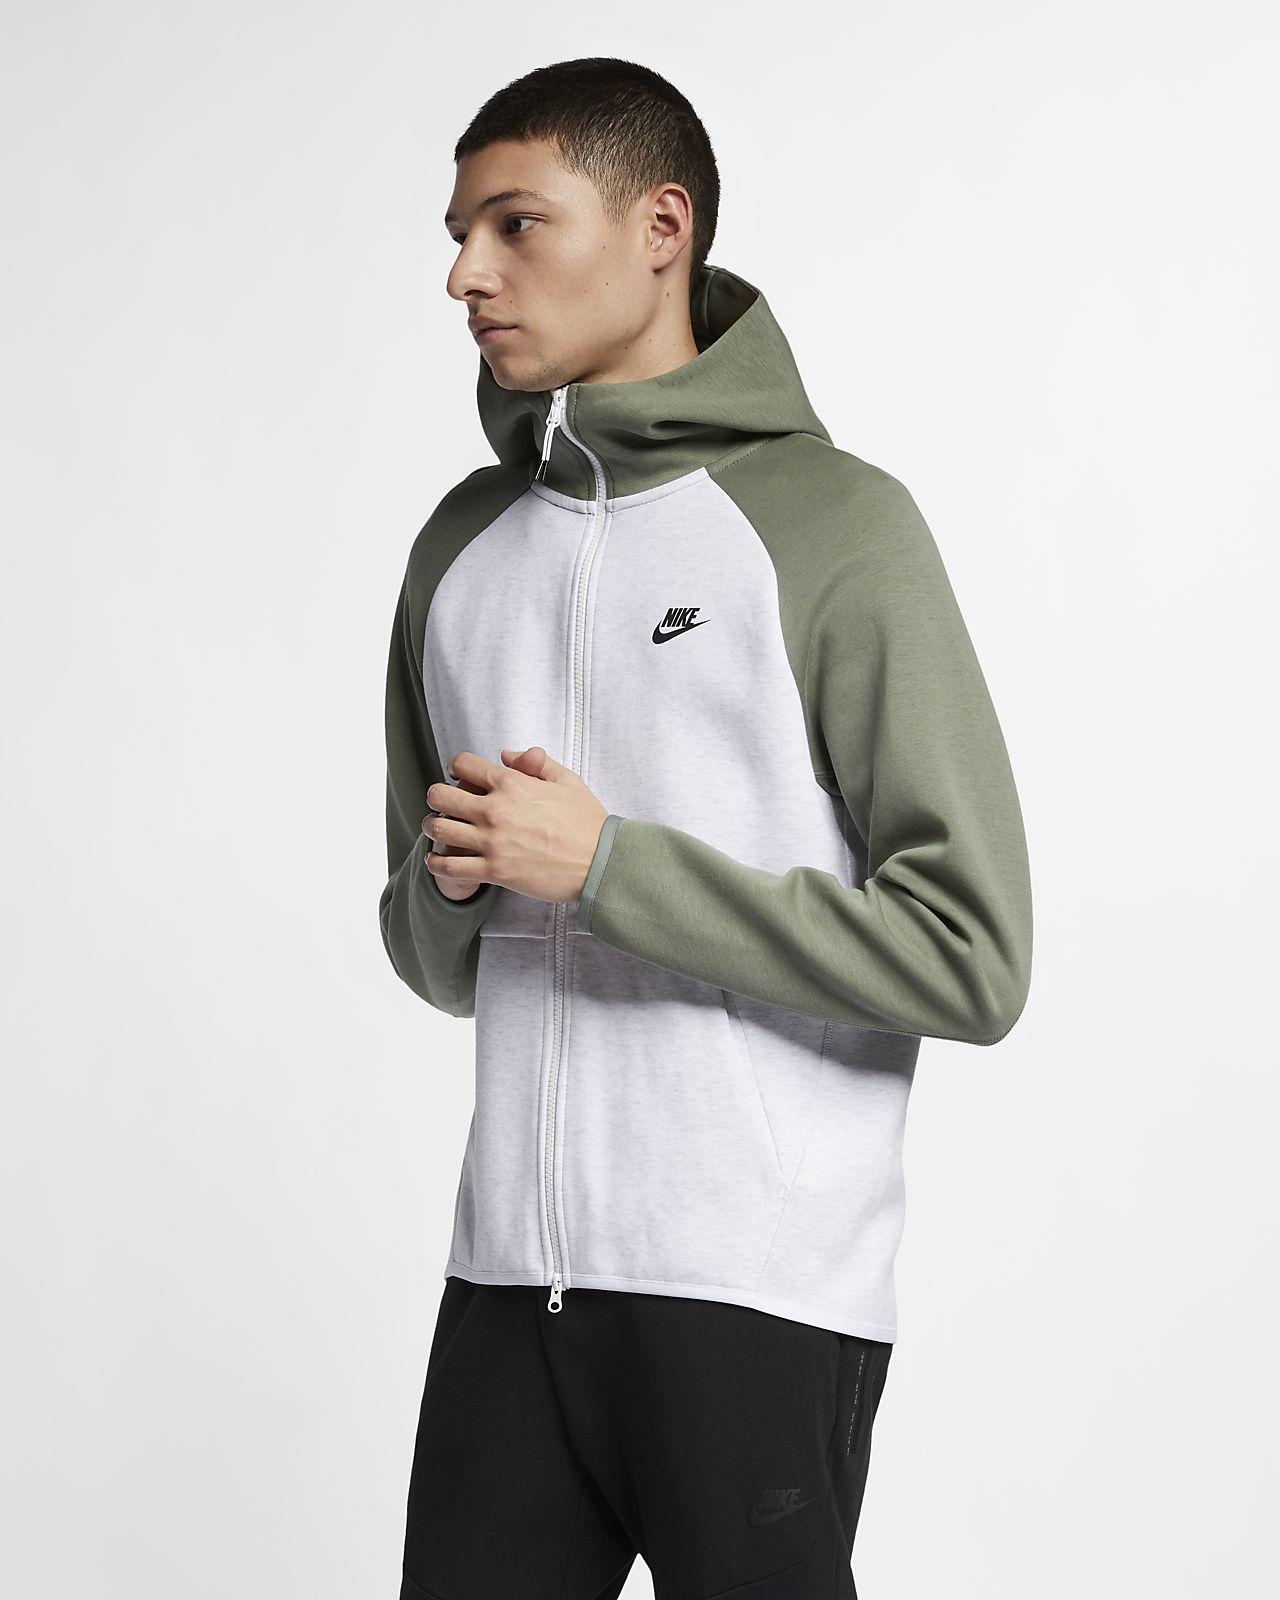 1420d328 ... Мужская худи с молнией во всю длину Nike Sportswear Tech Fleece